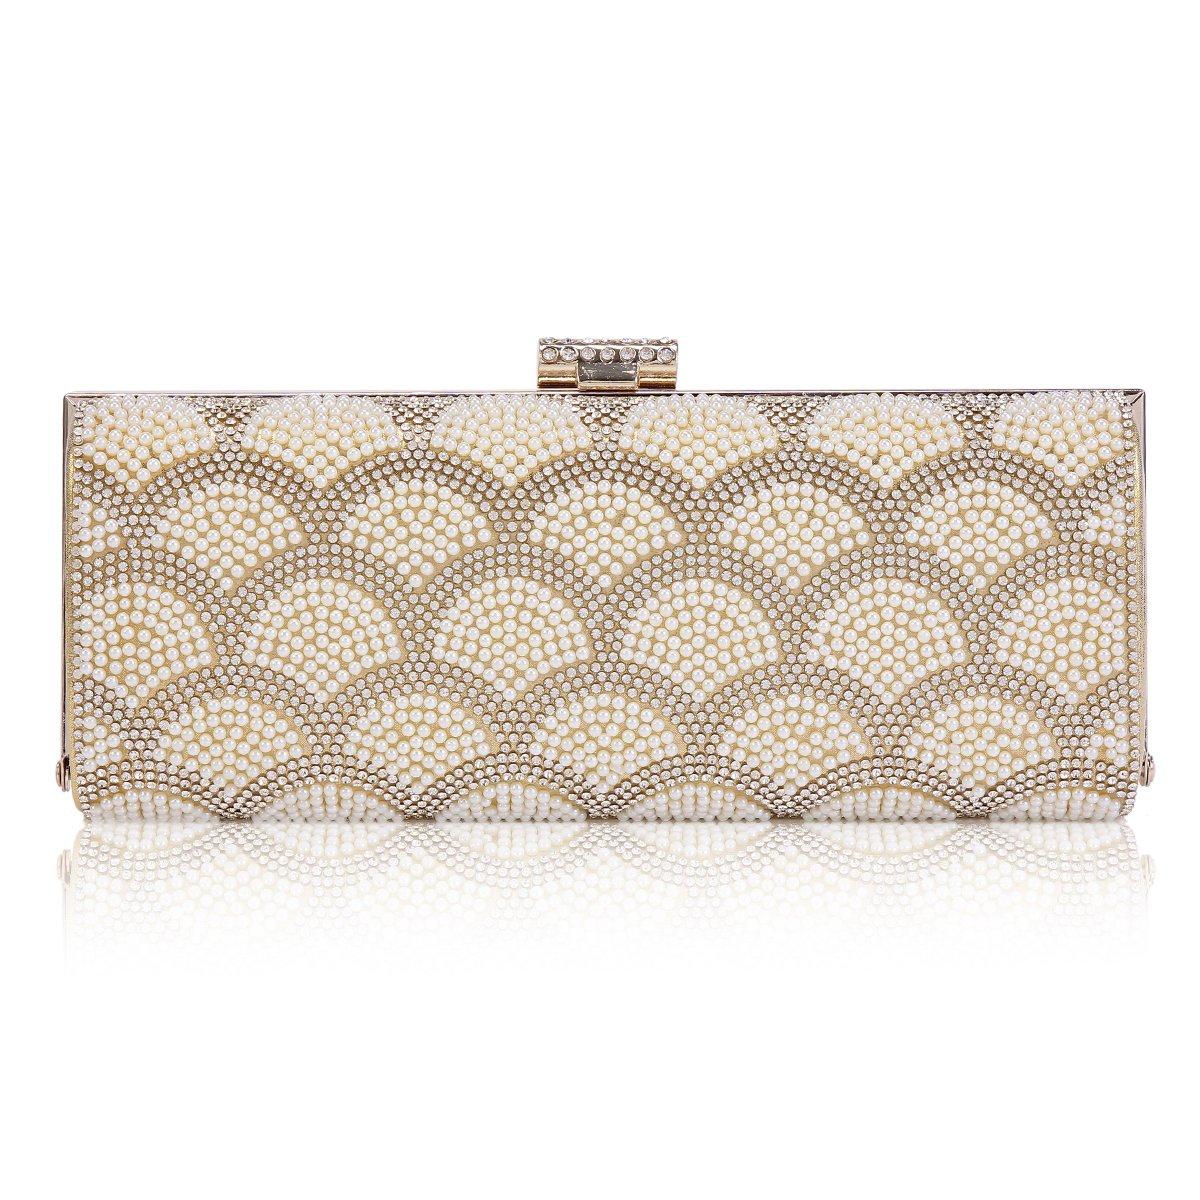 Damara Womens Clasp-top Hardcase Interlaced Beads Clutch Evening Bag,Gold